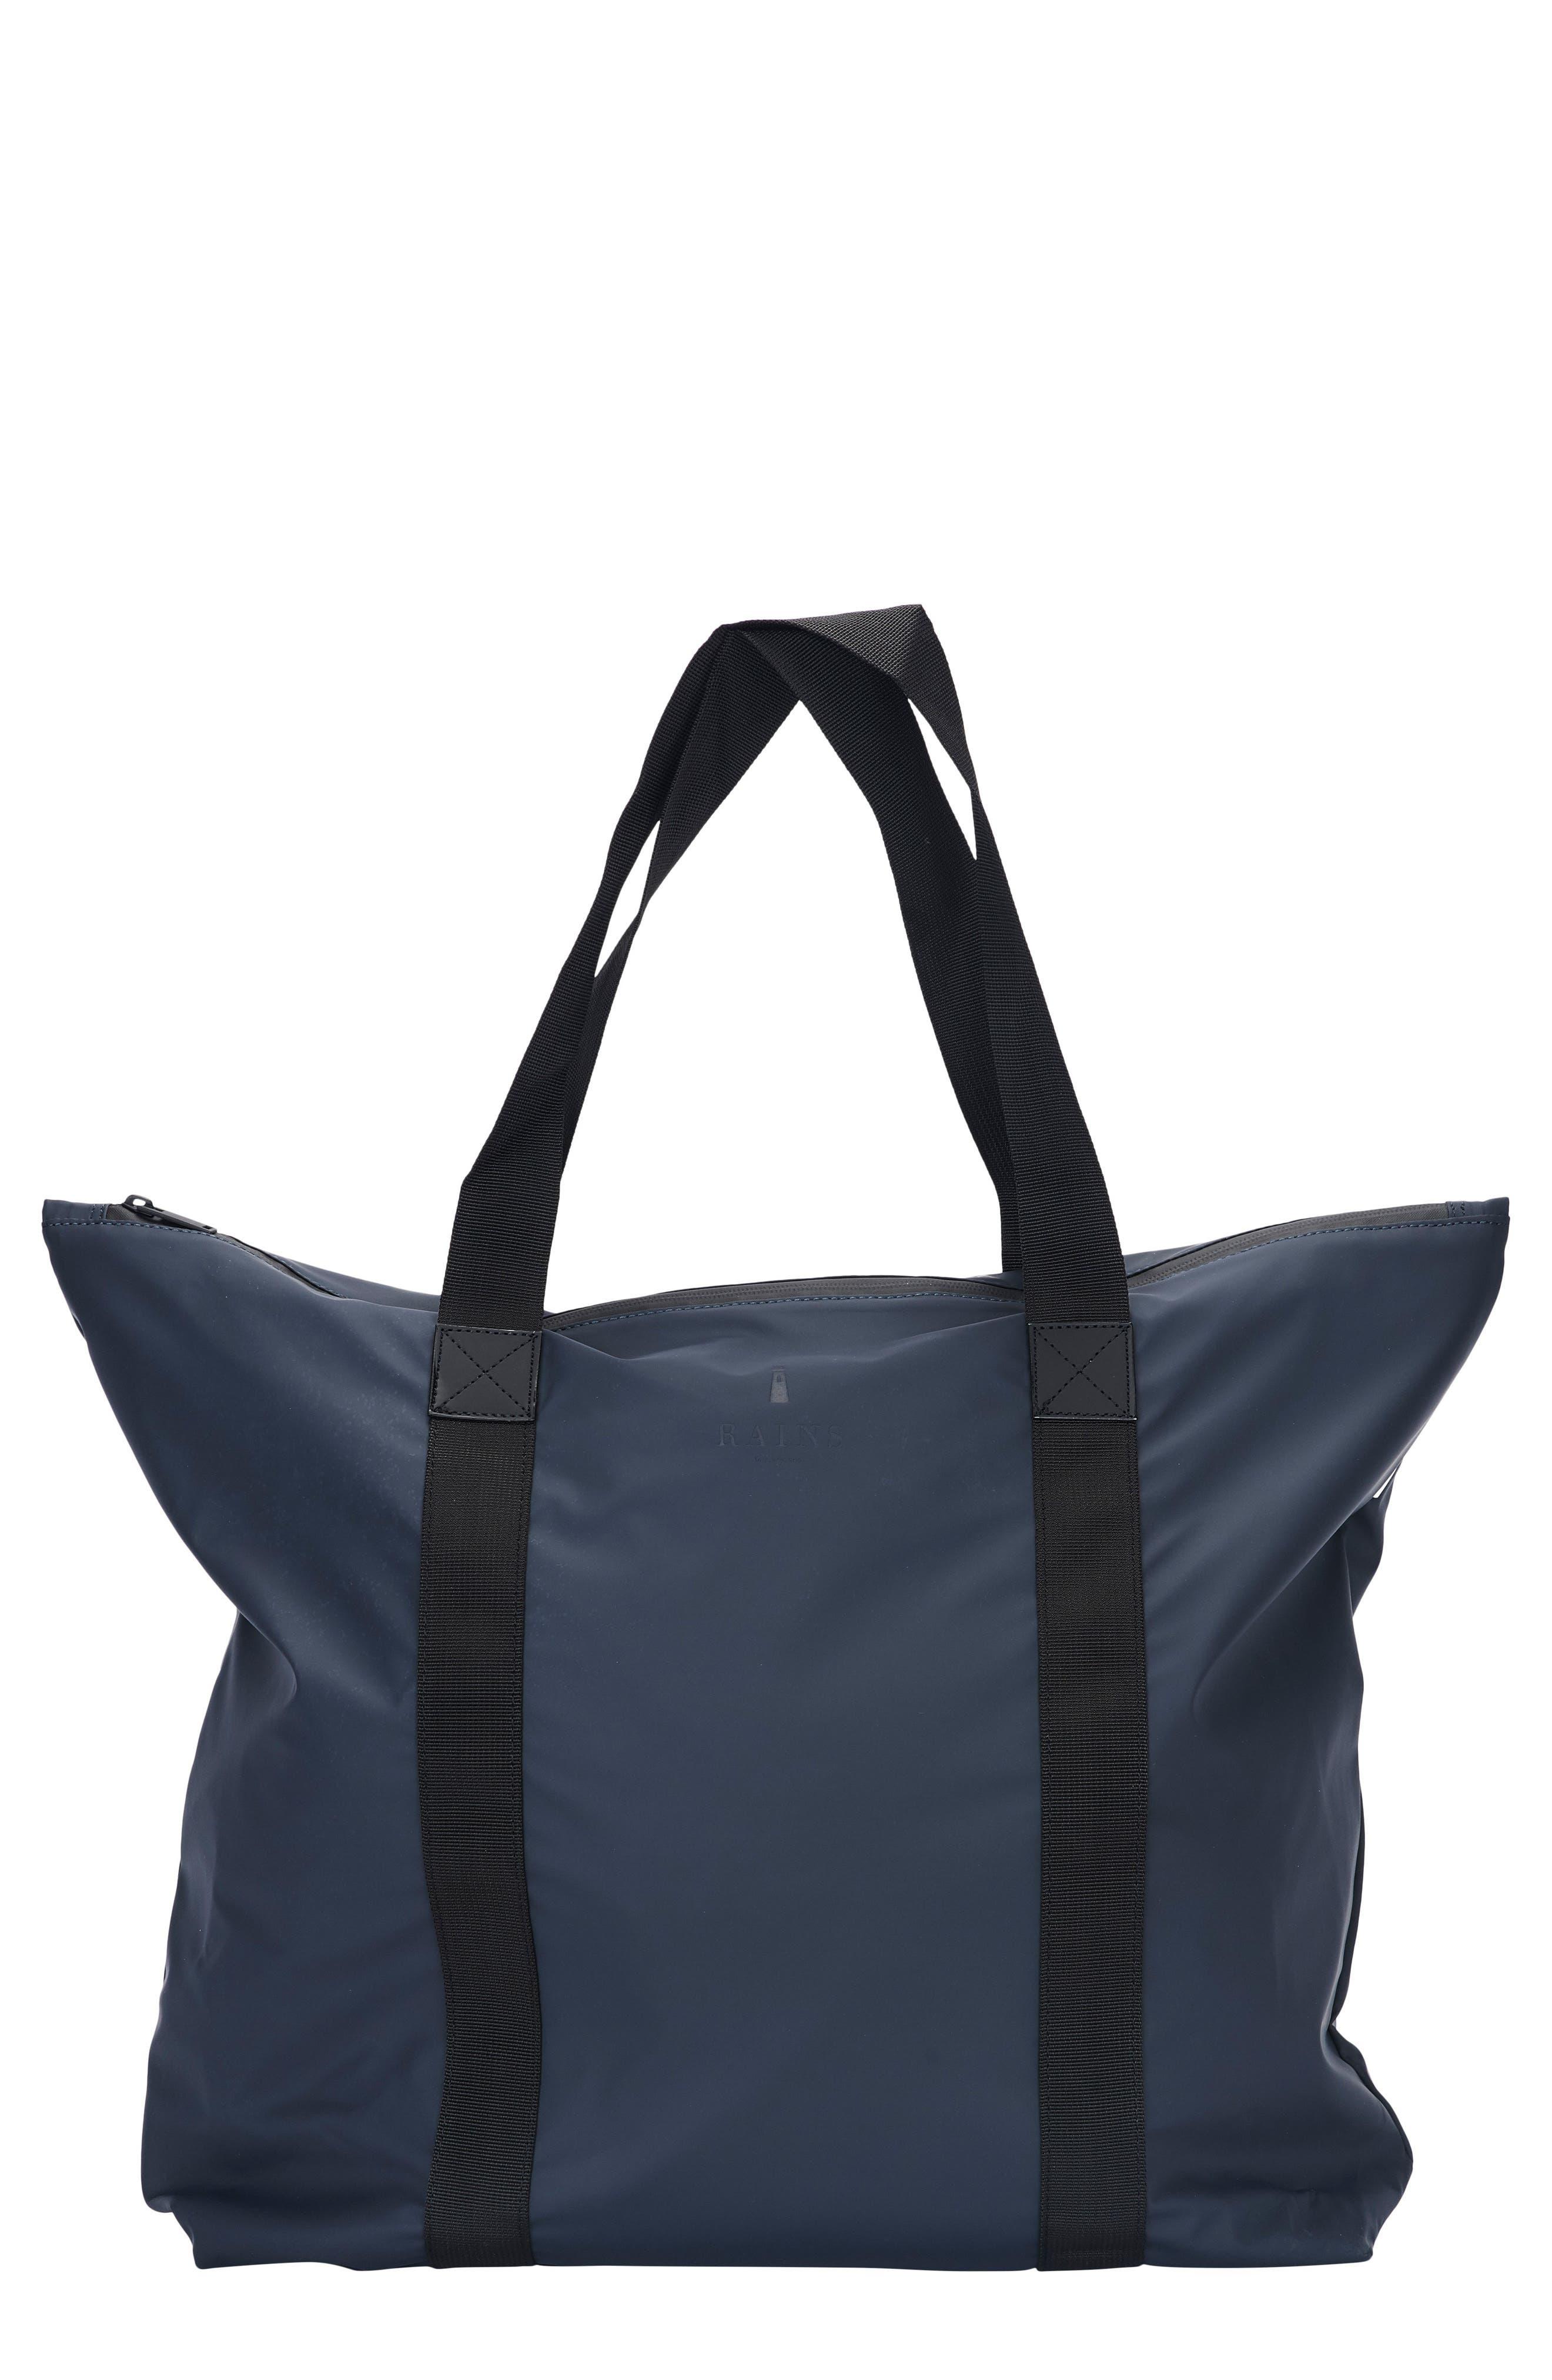 Waterproof Tote Bag,                             Main thumbnail 1, color,                             Blue